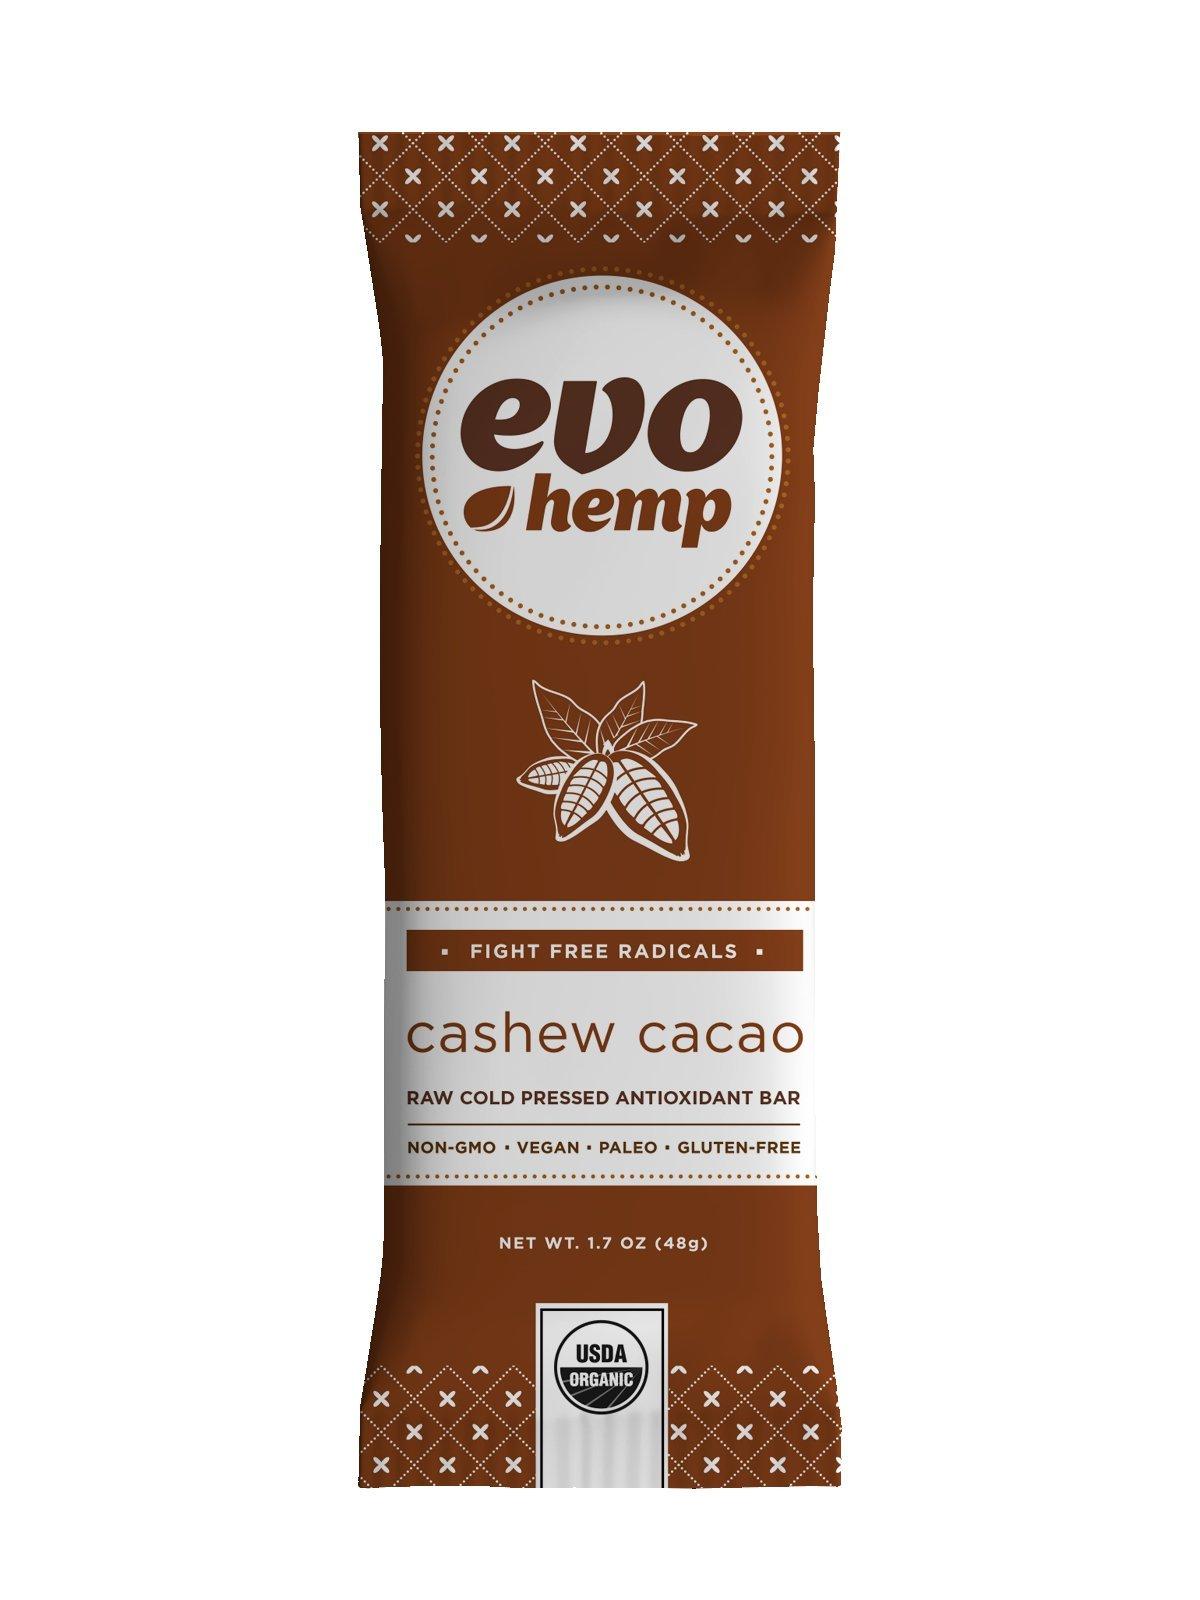 Evo Hemp - Cashew Cacao Plus Antioxidant Bar (Single Bar) - Power-Packed Healthy Snacks - Best Fruit and Nut Bars With Omega 3s, Hemp Protein and Fiber - 100% Organic Snacks With Amazing Taste